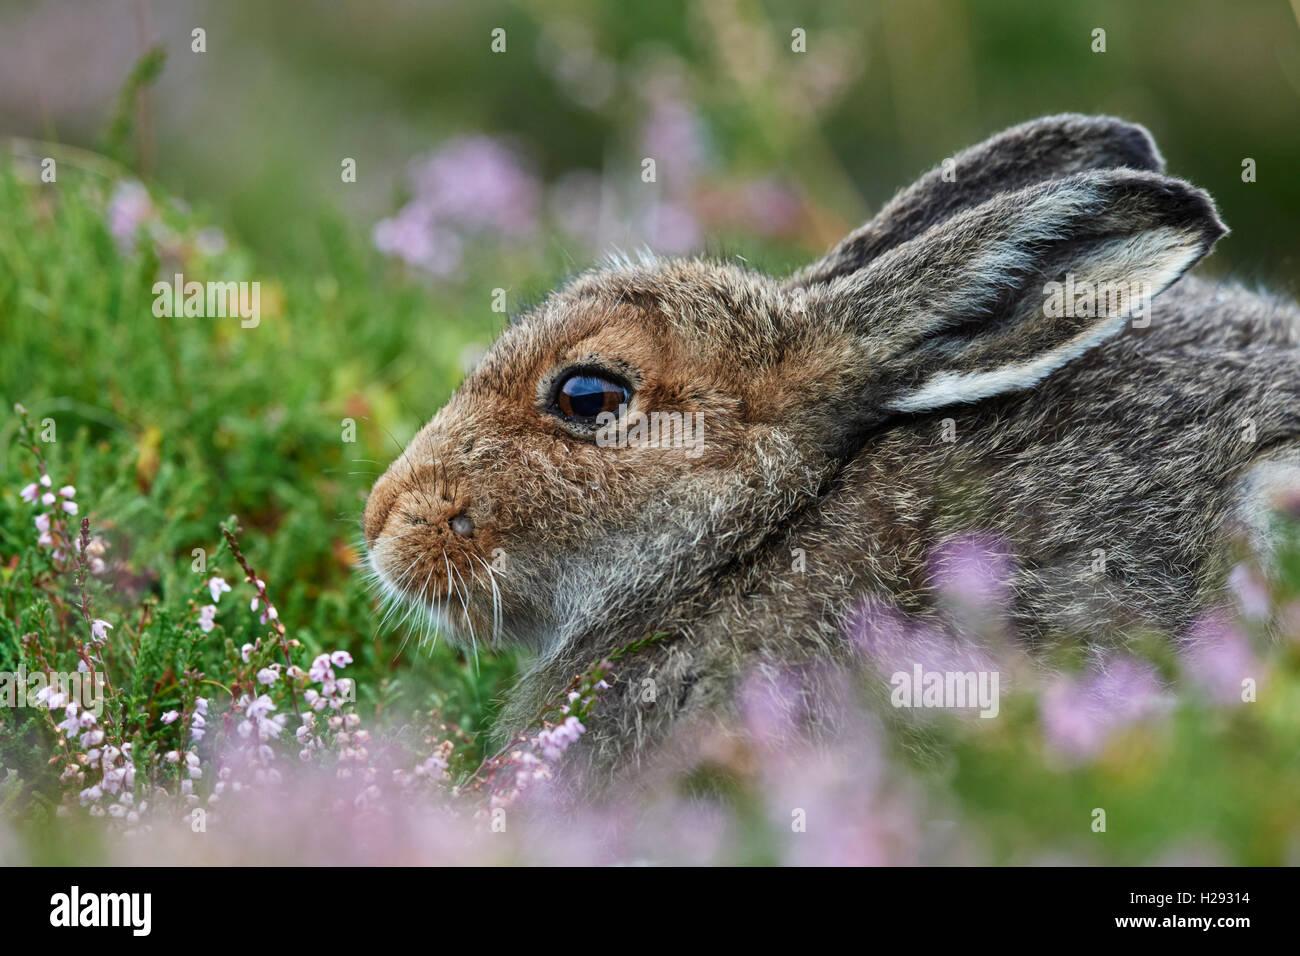 La liebre de montaña (Lepus timidus), Scotland, Reino Unido Imagen De Stock